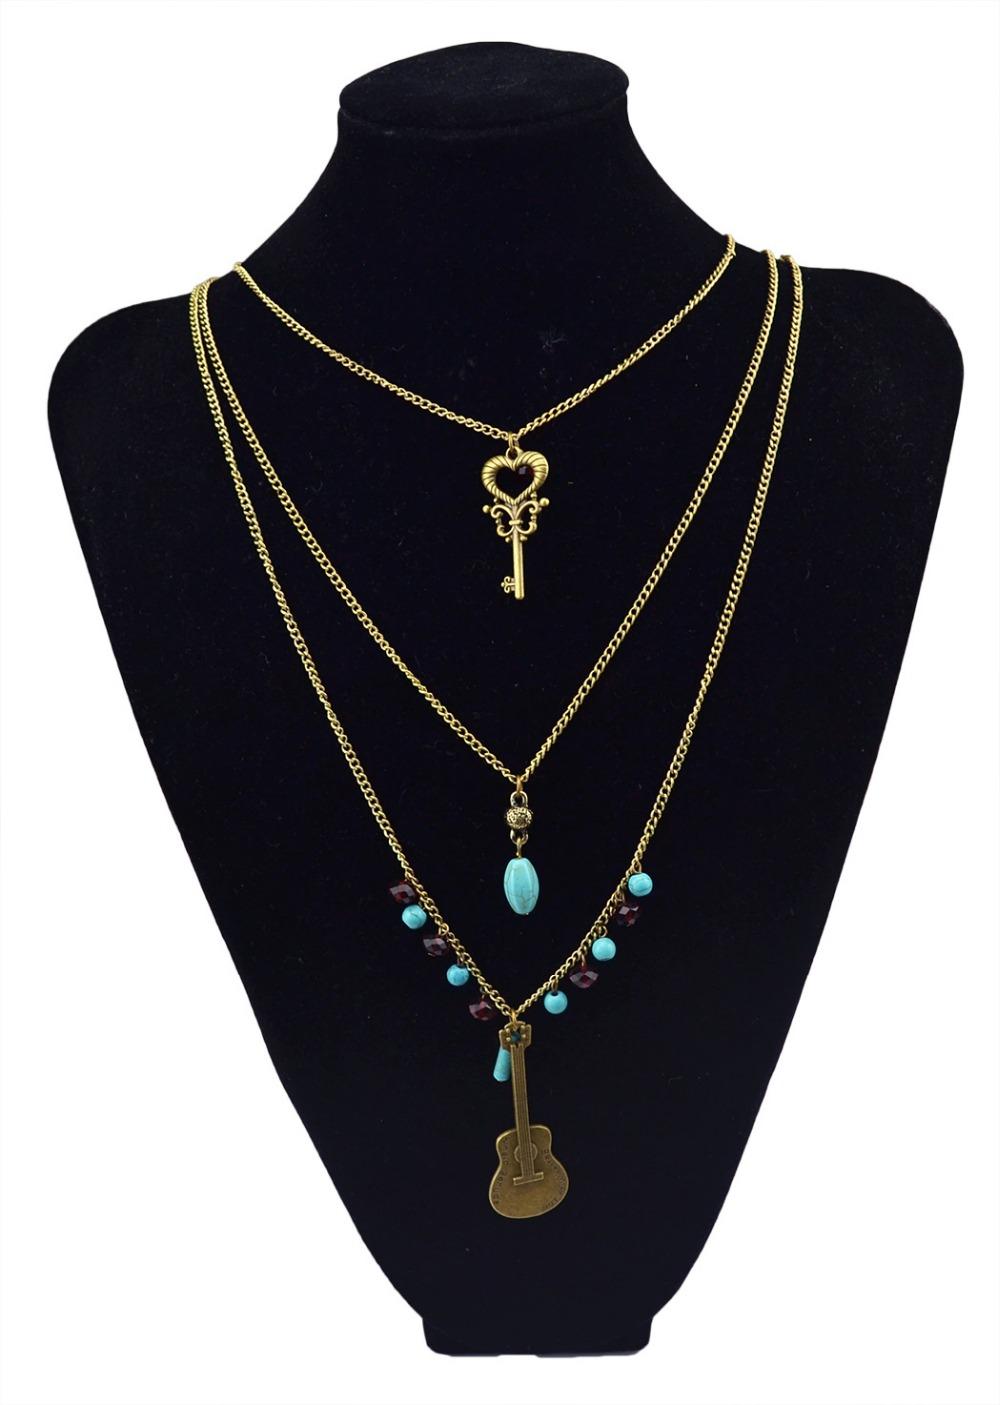 New Fashion European Multilayer Retro Bronze Keys Guitar chain Rhine stone Pendant Necklace(China (Mainland))